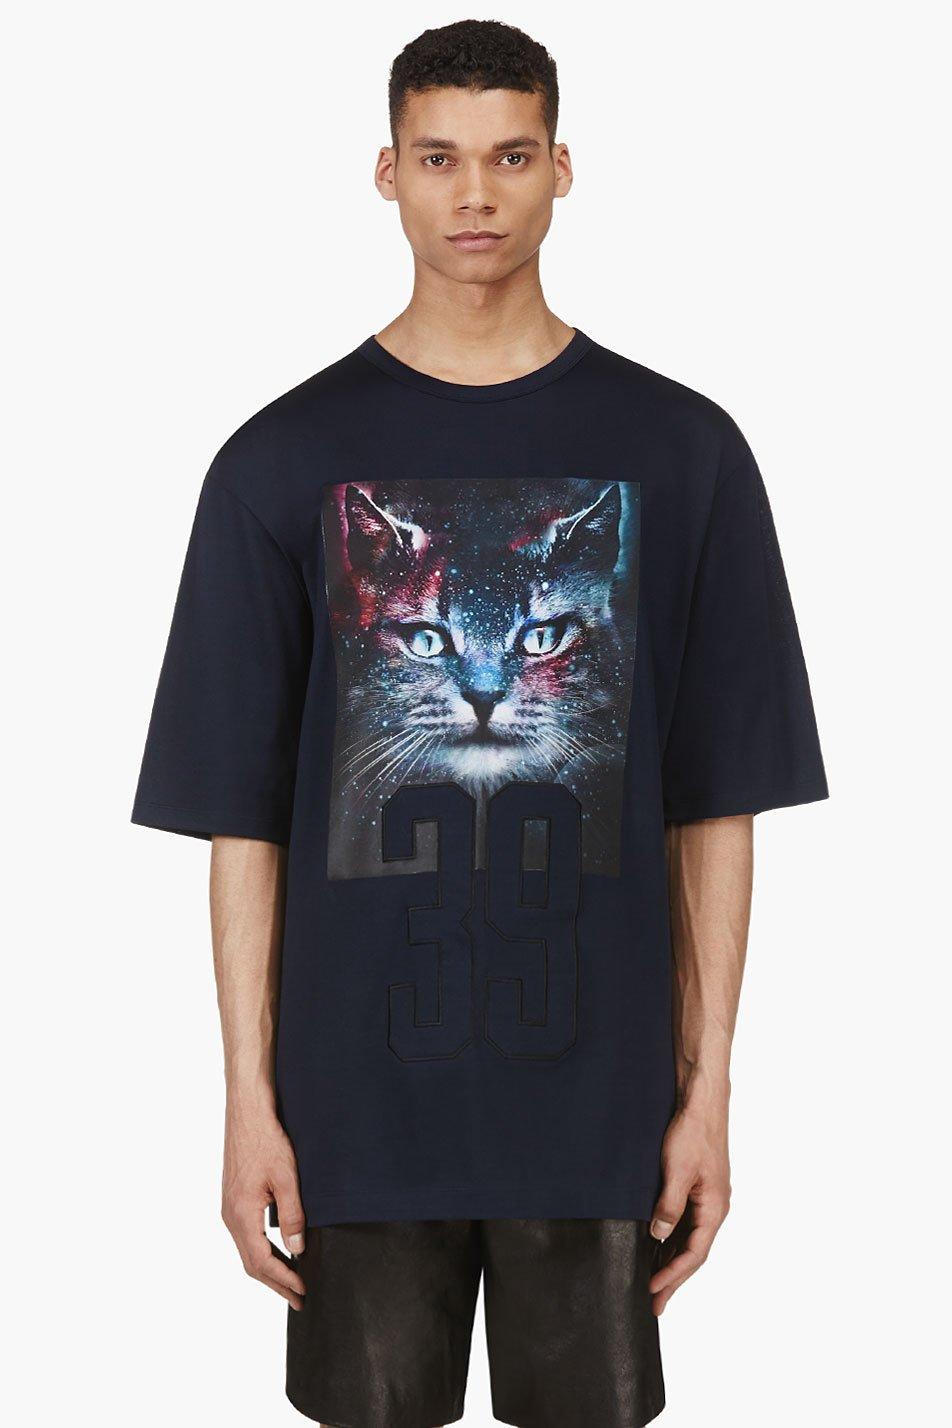 Juun.j ssense exclusive blue and green cosmic cat t_shirt